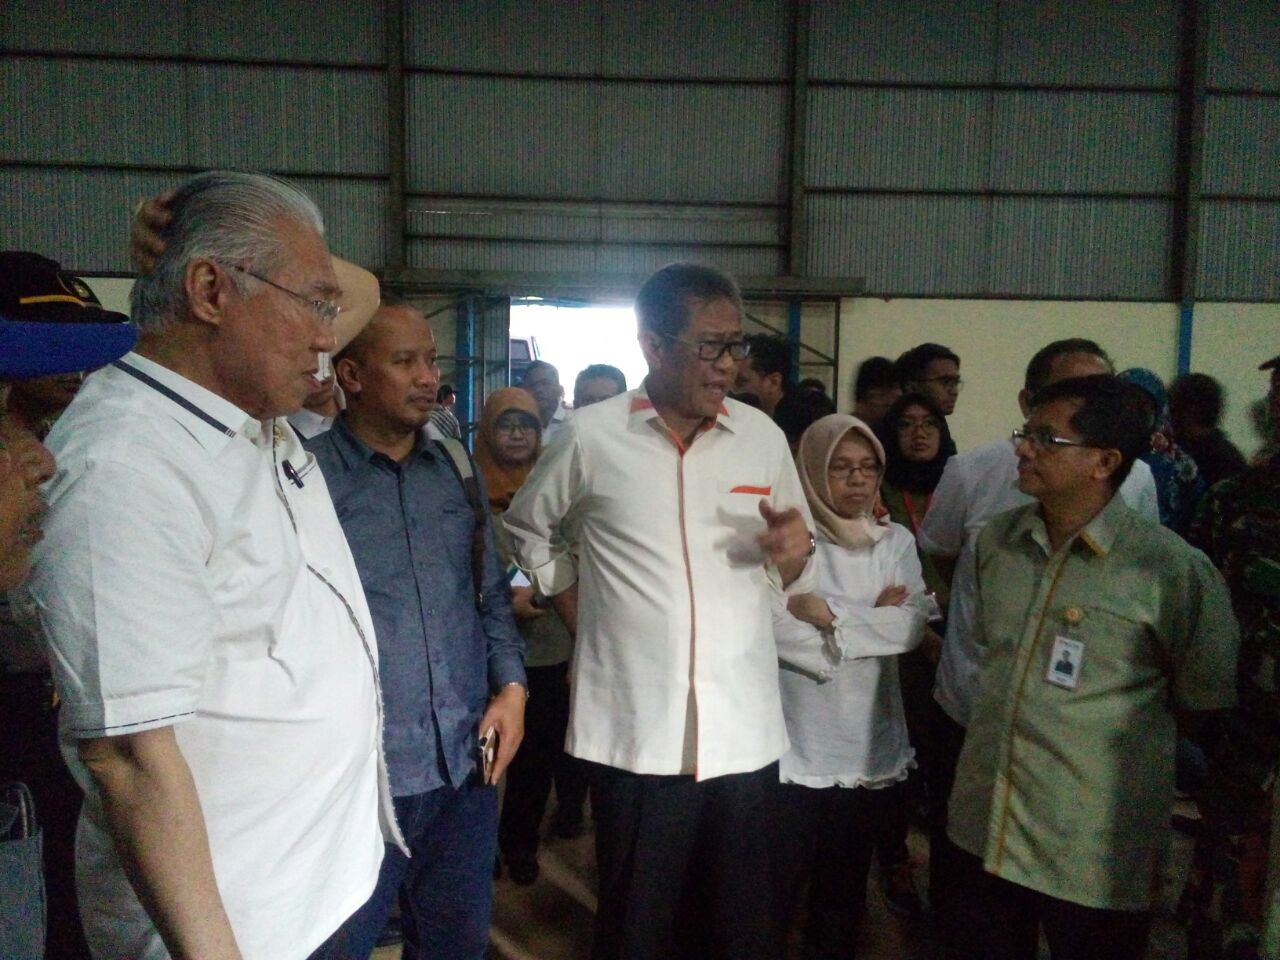 https: img-o.okeinfo.net content 2018 02 28 320 1865903 gudang-beras-bulog-di-indramayu-kosong-apa-benar-indonesia-surplus-beras-WMFDtFRpFT.jpeg